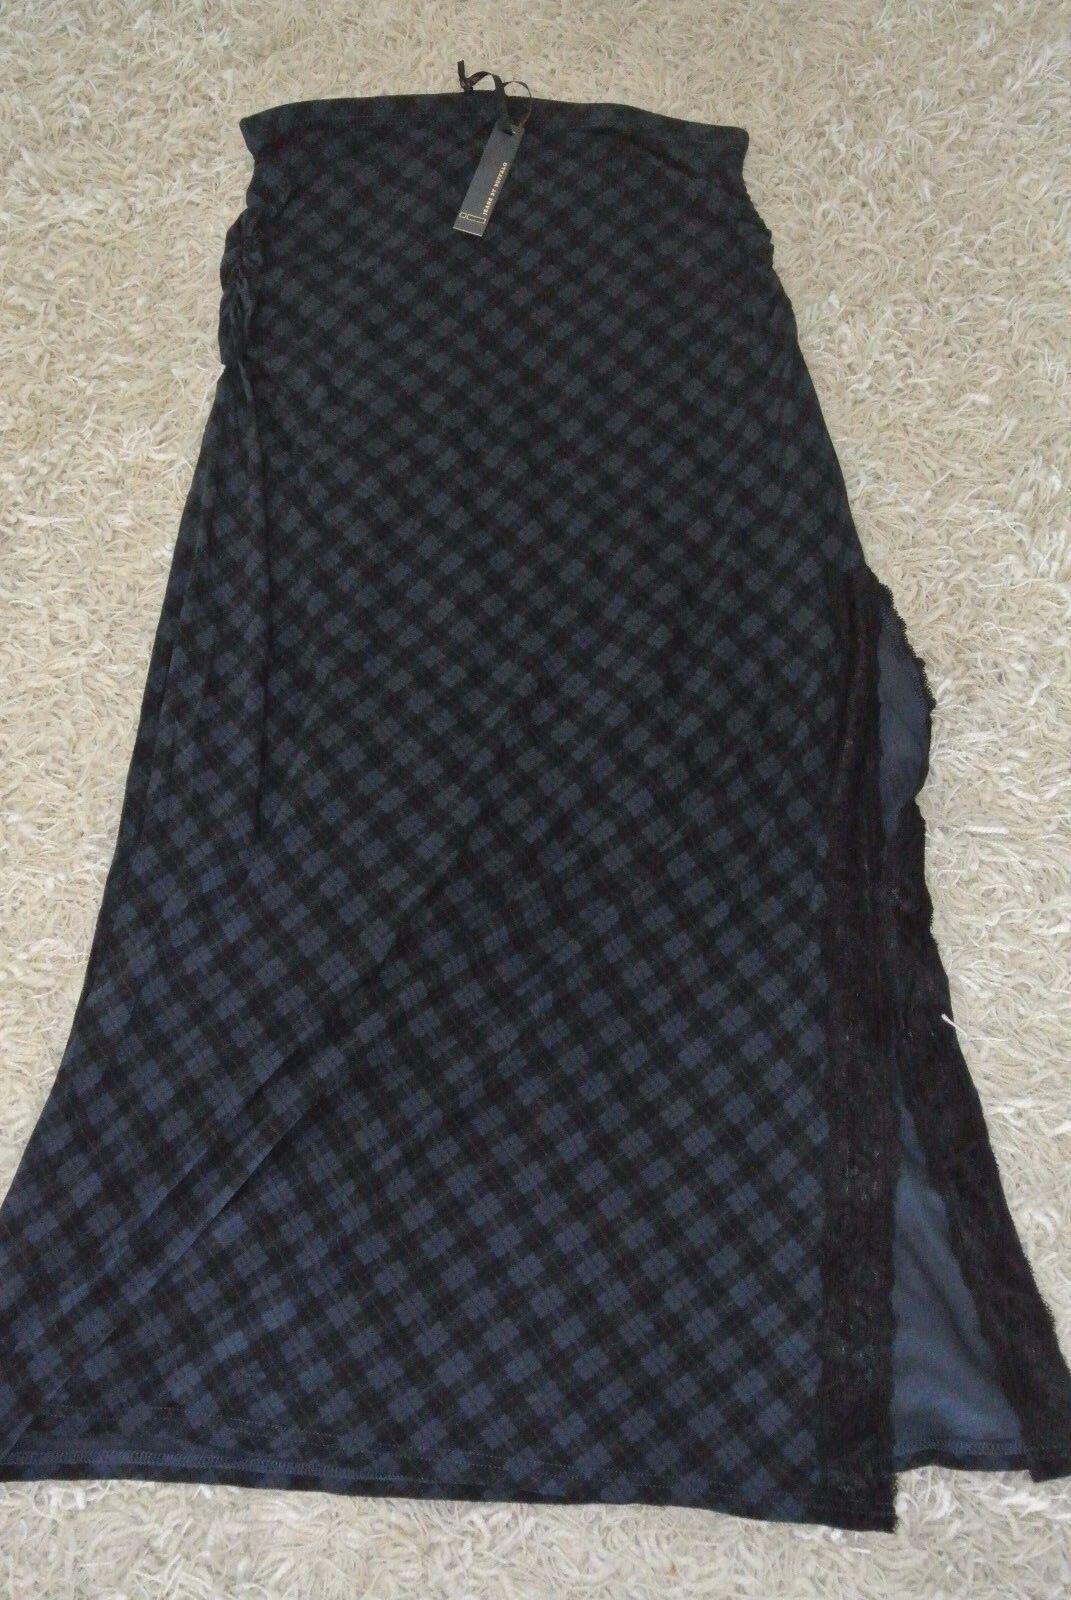 JEANS BY BUFFALO MAXI BOHO Skirt L XL NWT 89 Amazing Fabric-Stretch-bluees-Plaid